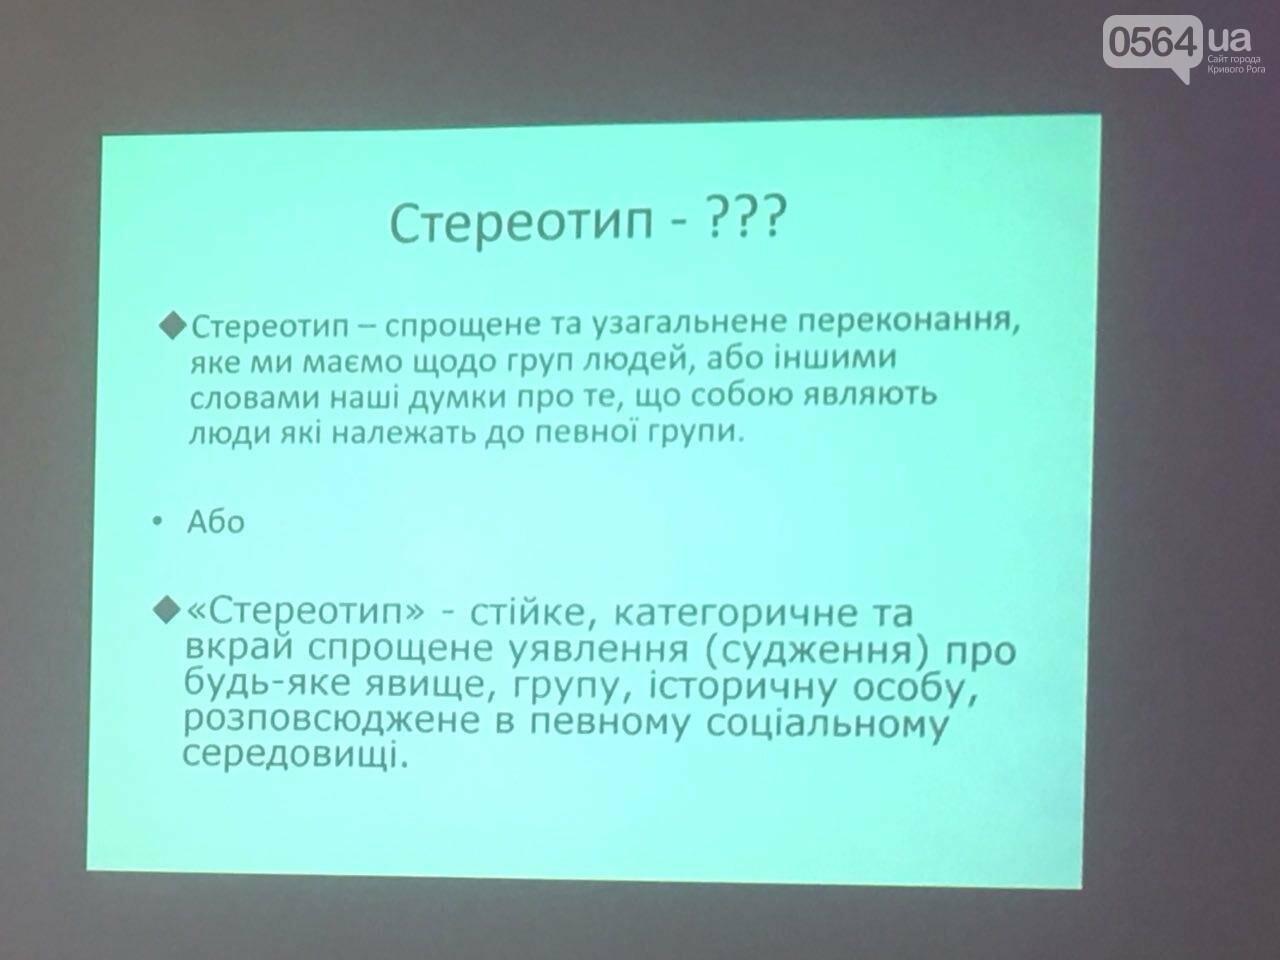 На тренинге о ВИЧ и медреформе криворожским журналистам рассказали о дискриминации и стереотипах, - ФОТО , фото-13